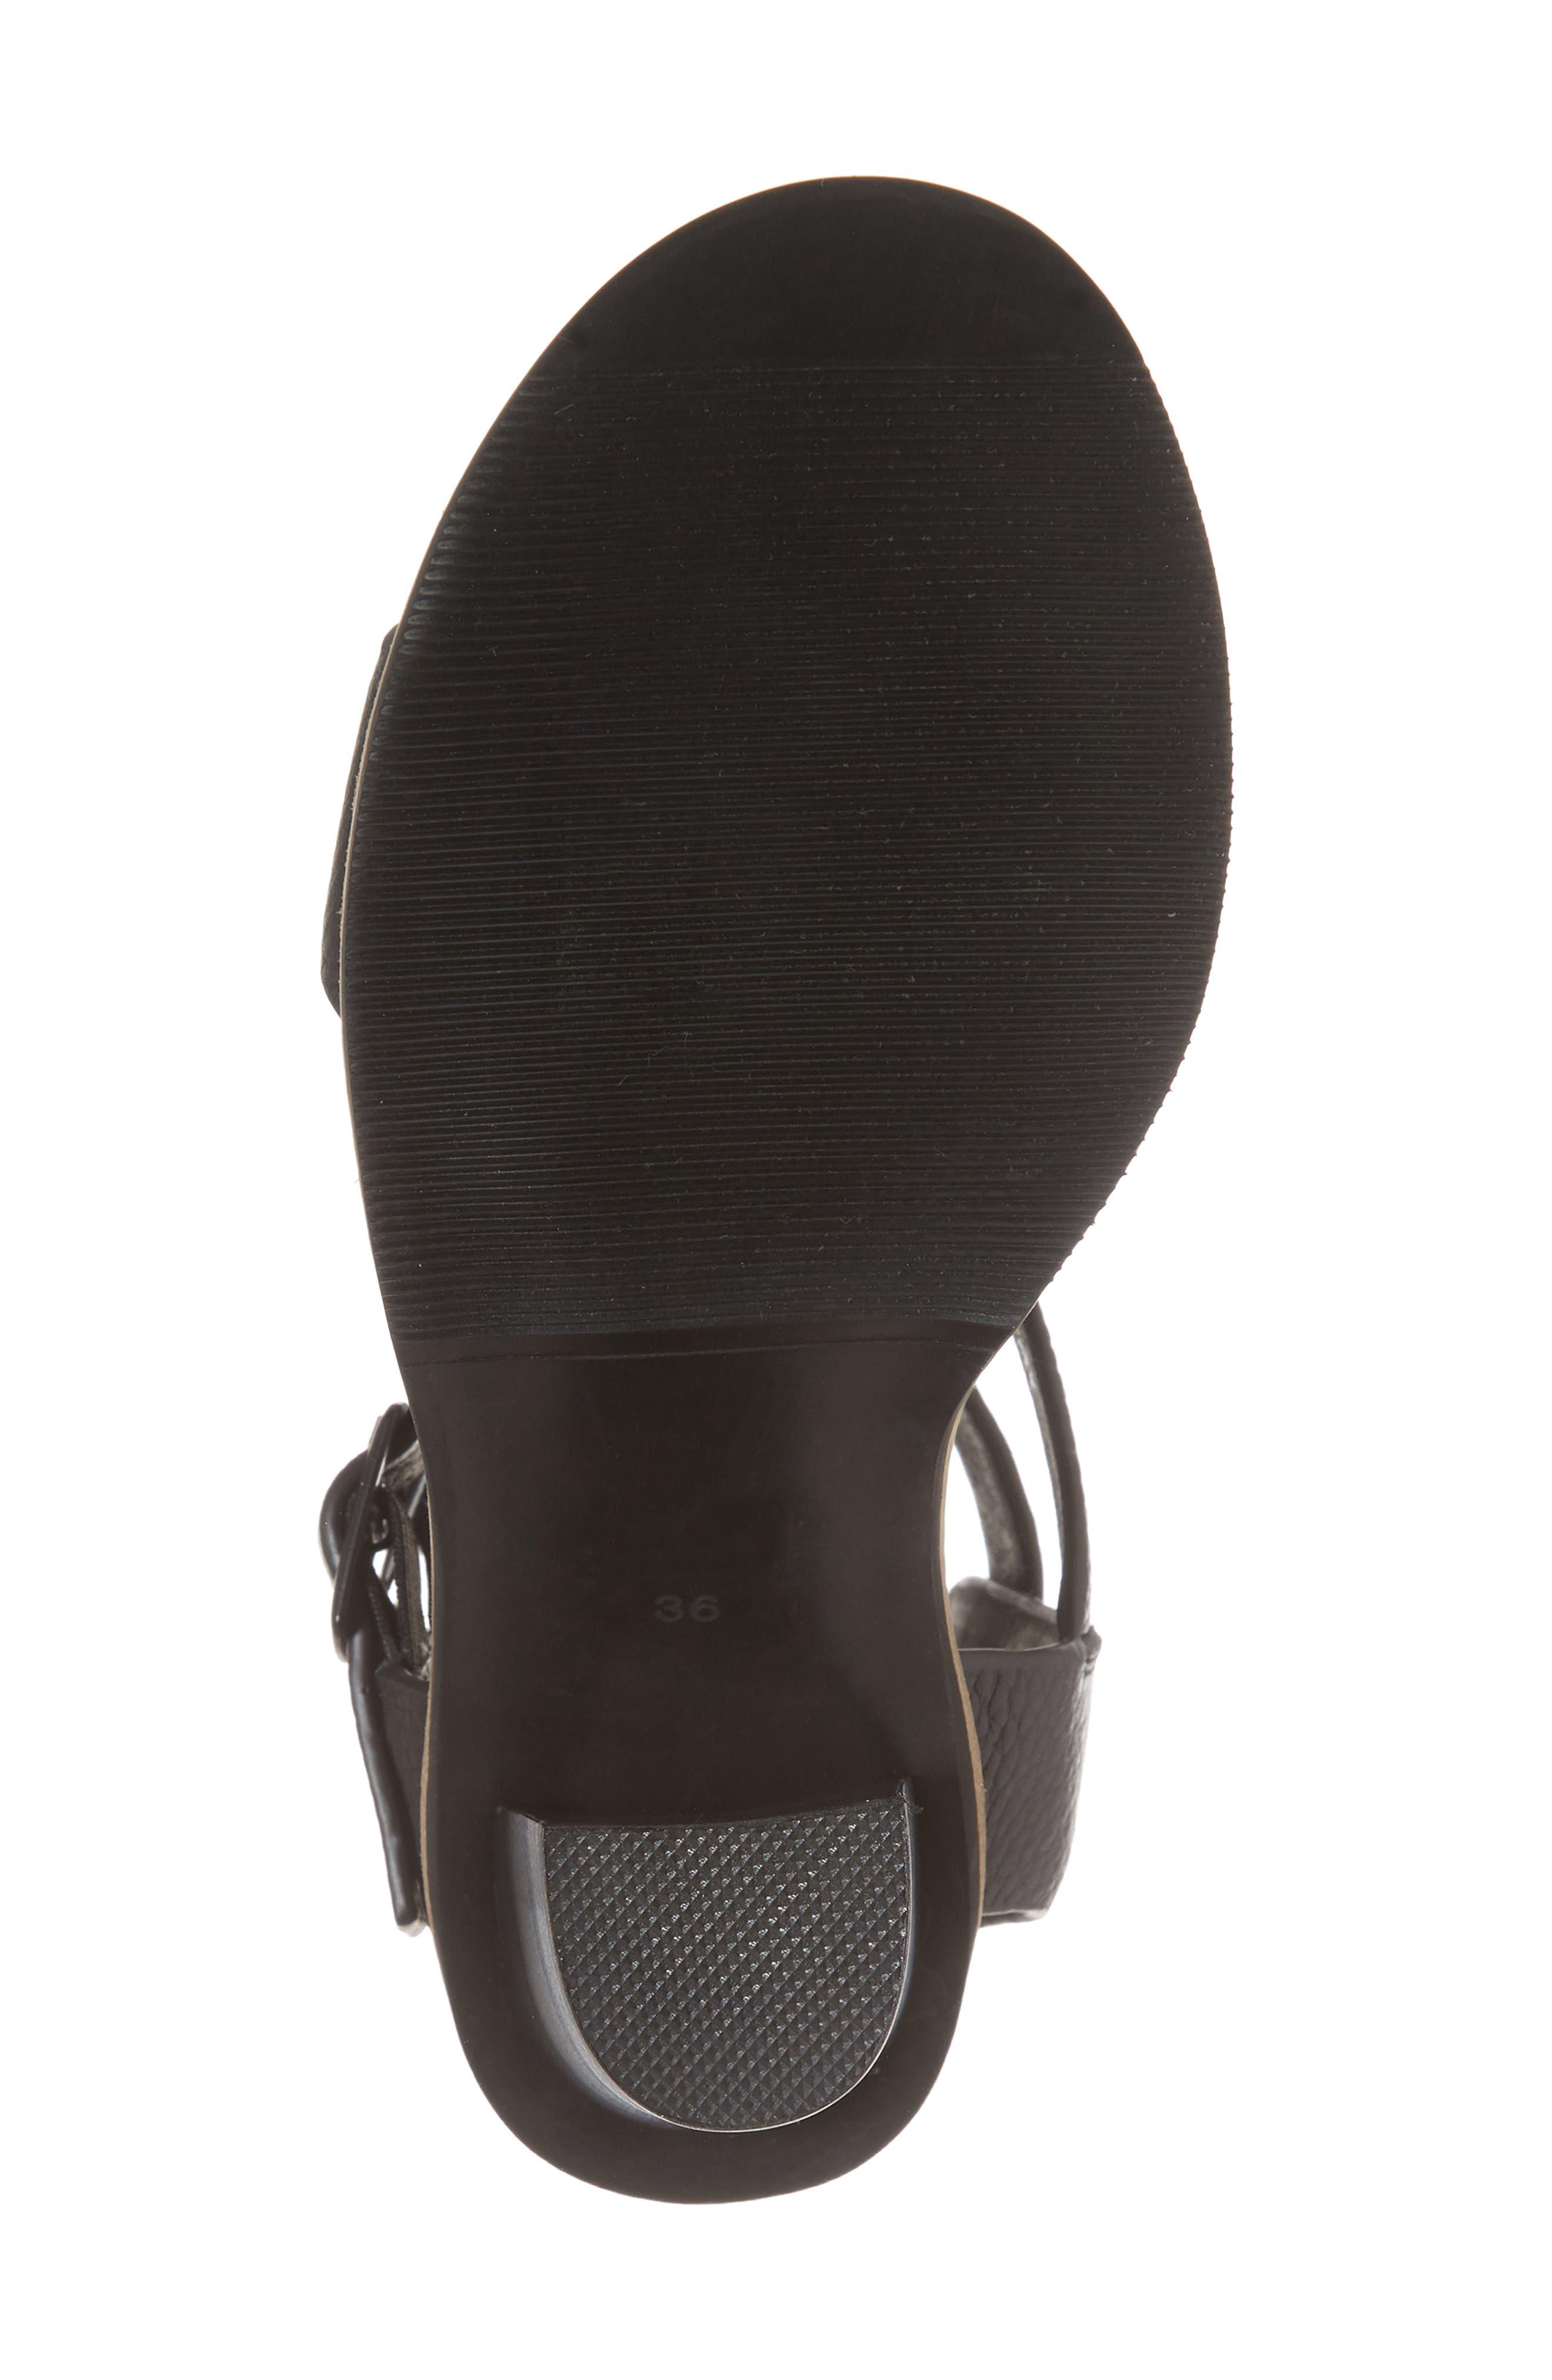 Casper Tall Sandal,                             Alternate thumbnail 6, color,                             Black Leather